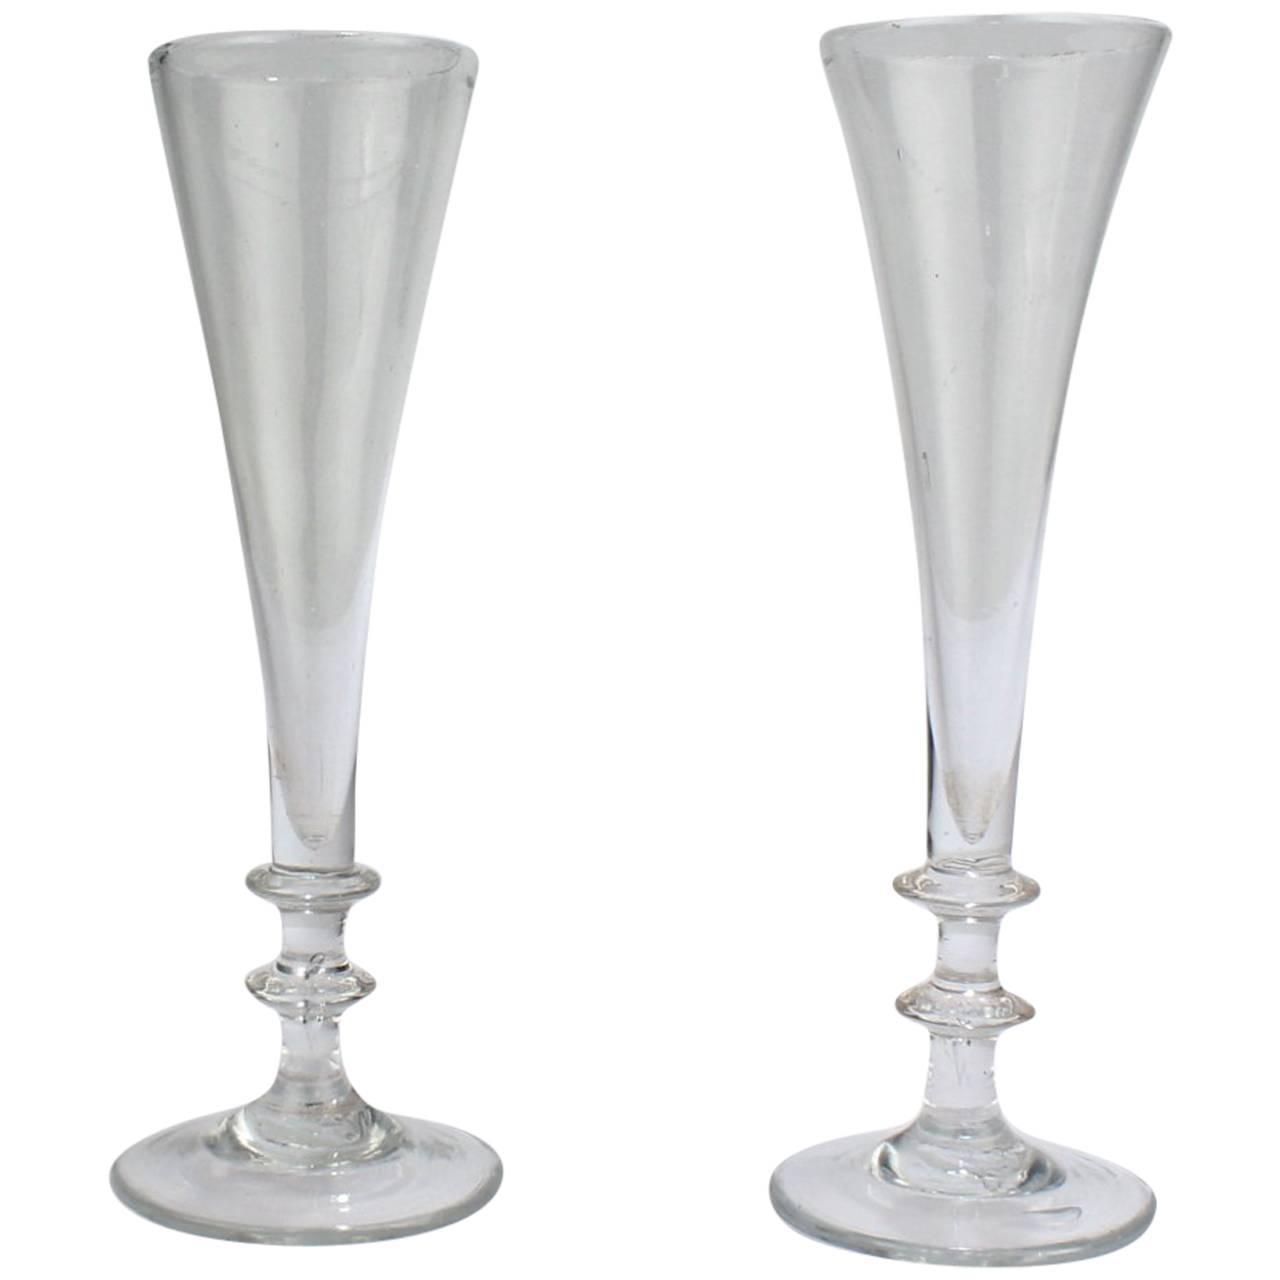 near pair of antique 18th century georgian period glass champagne flutes